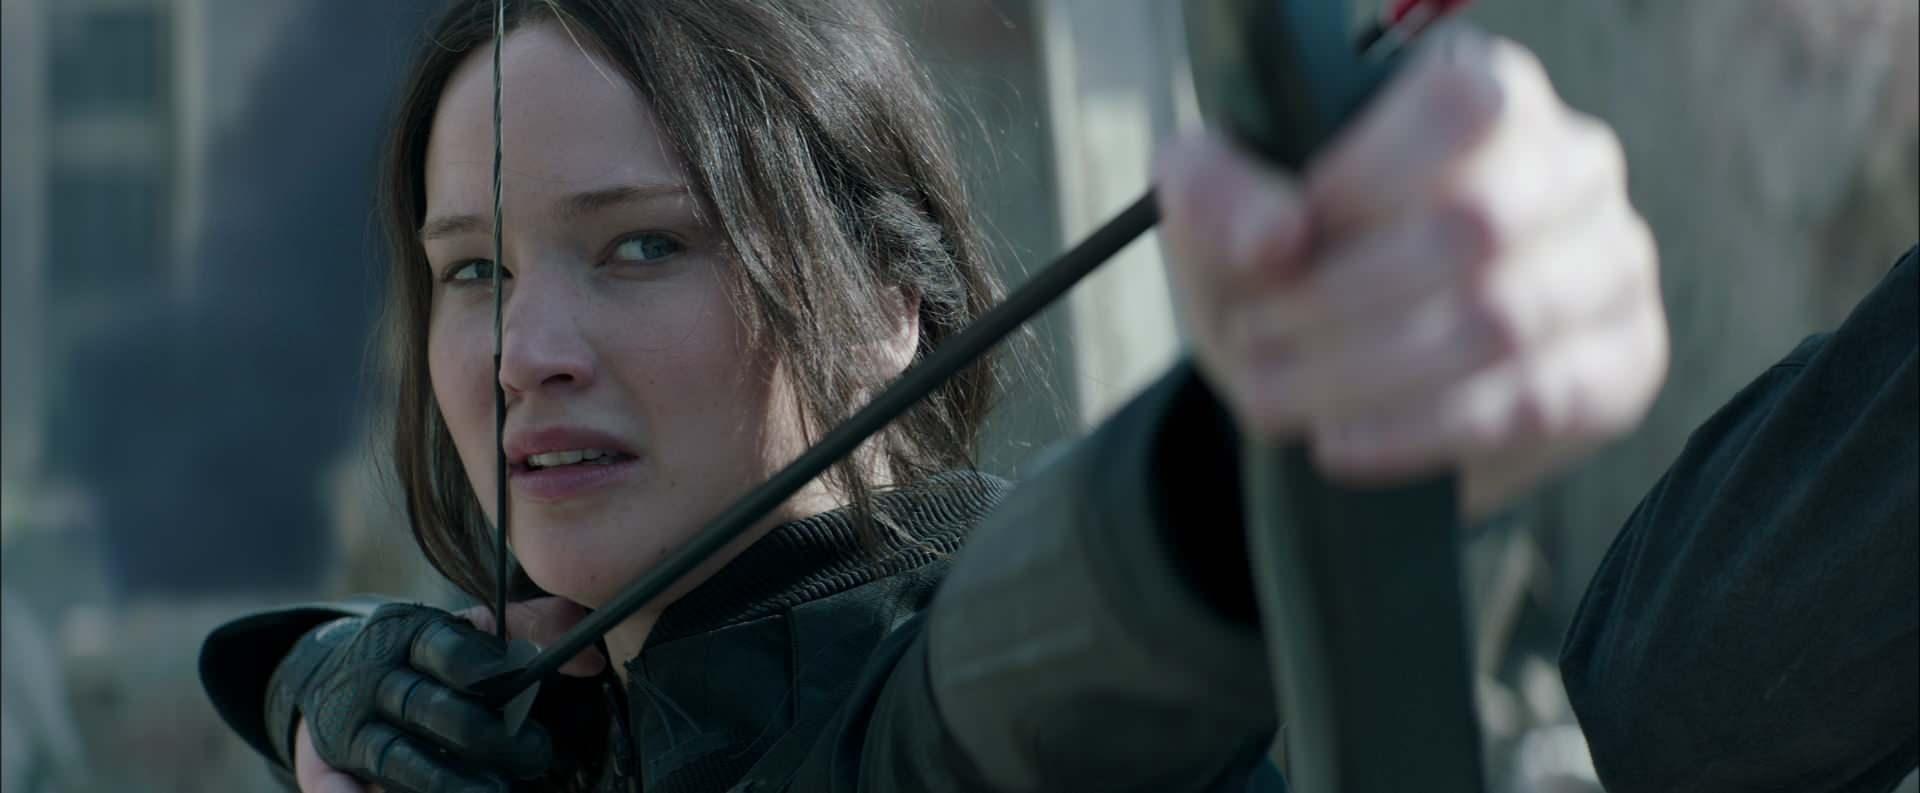 New Hunger Games Mockingjay Part 1 Trailer Goes Heavy On The Drama New Hunger Games Mockingjay Hunger Games